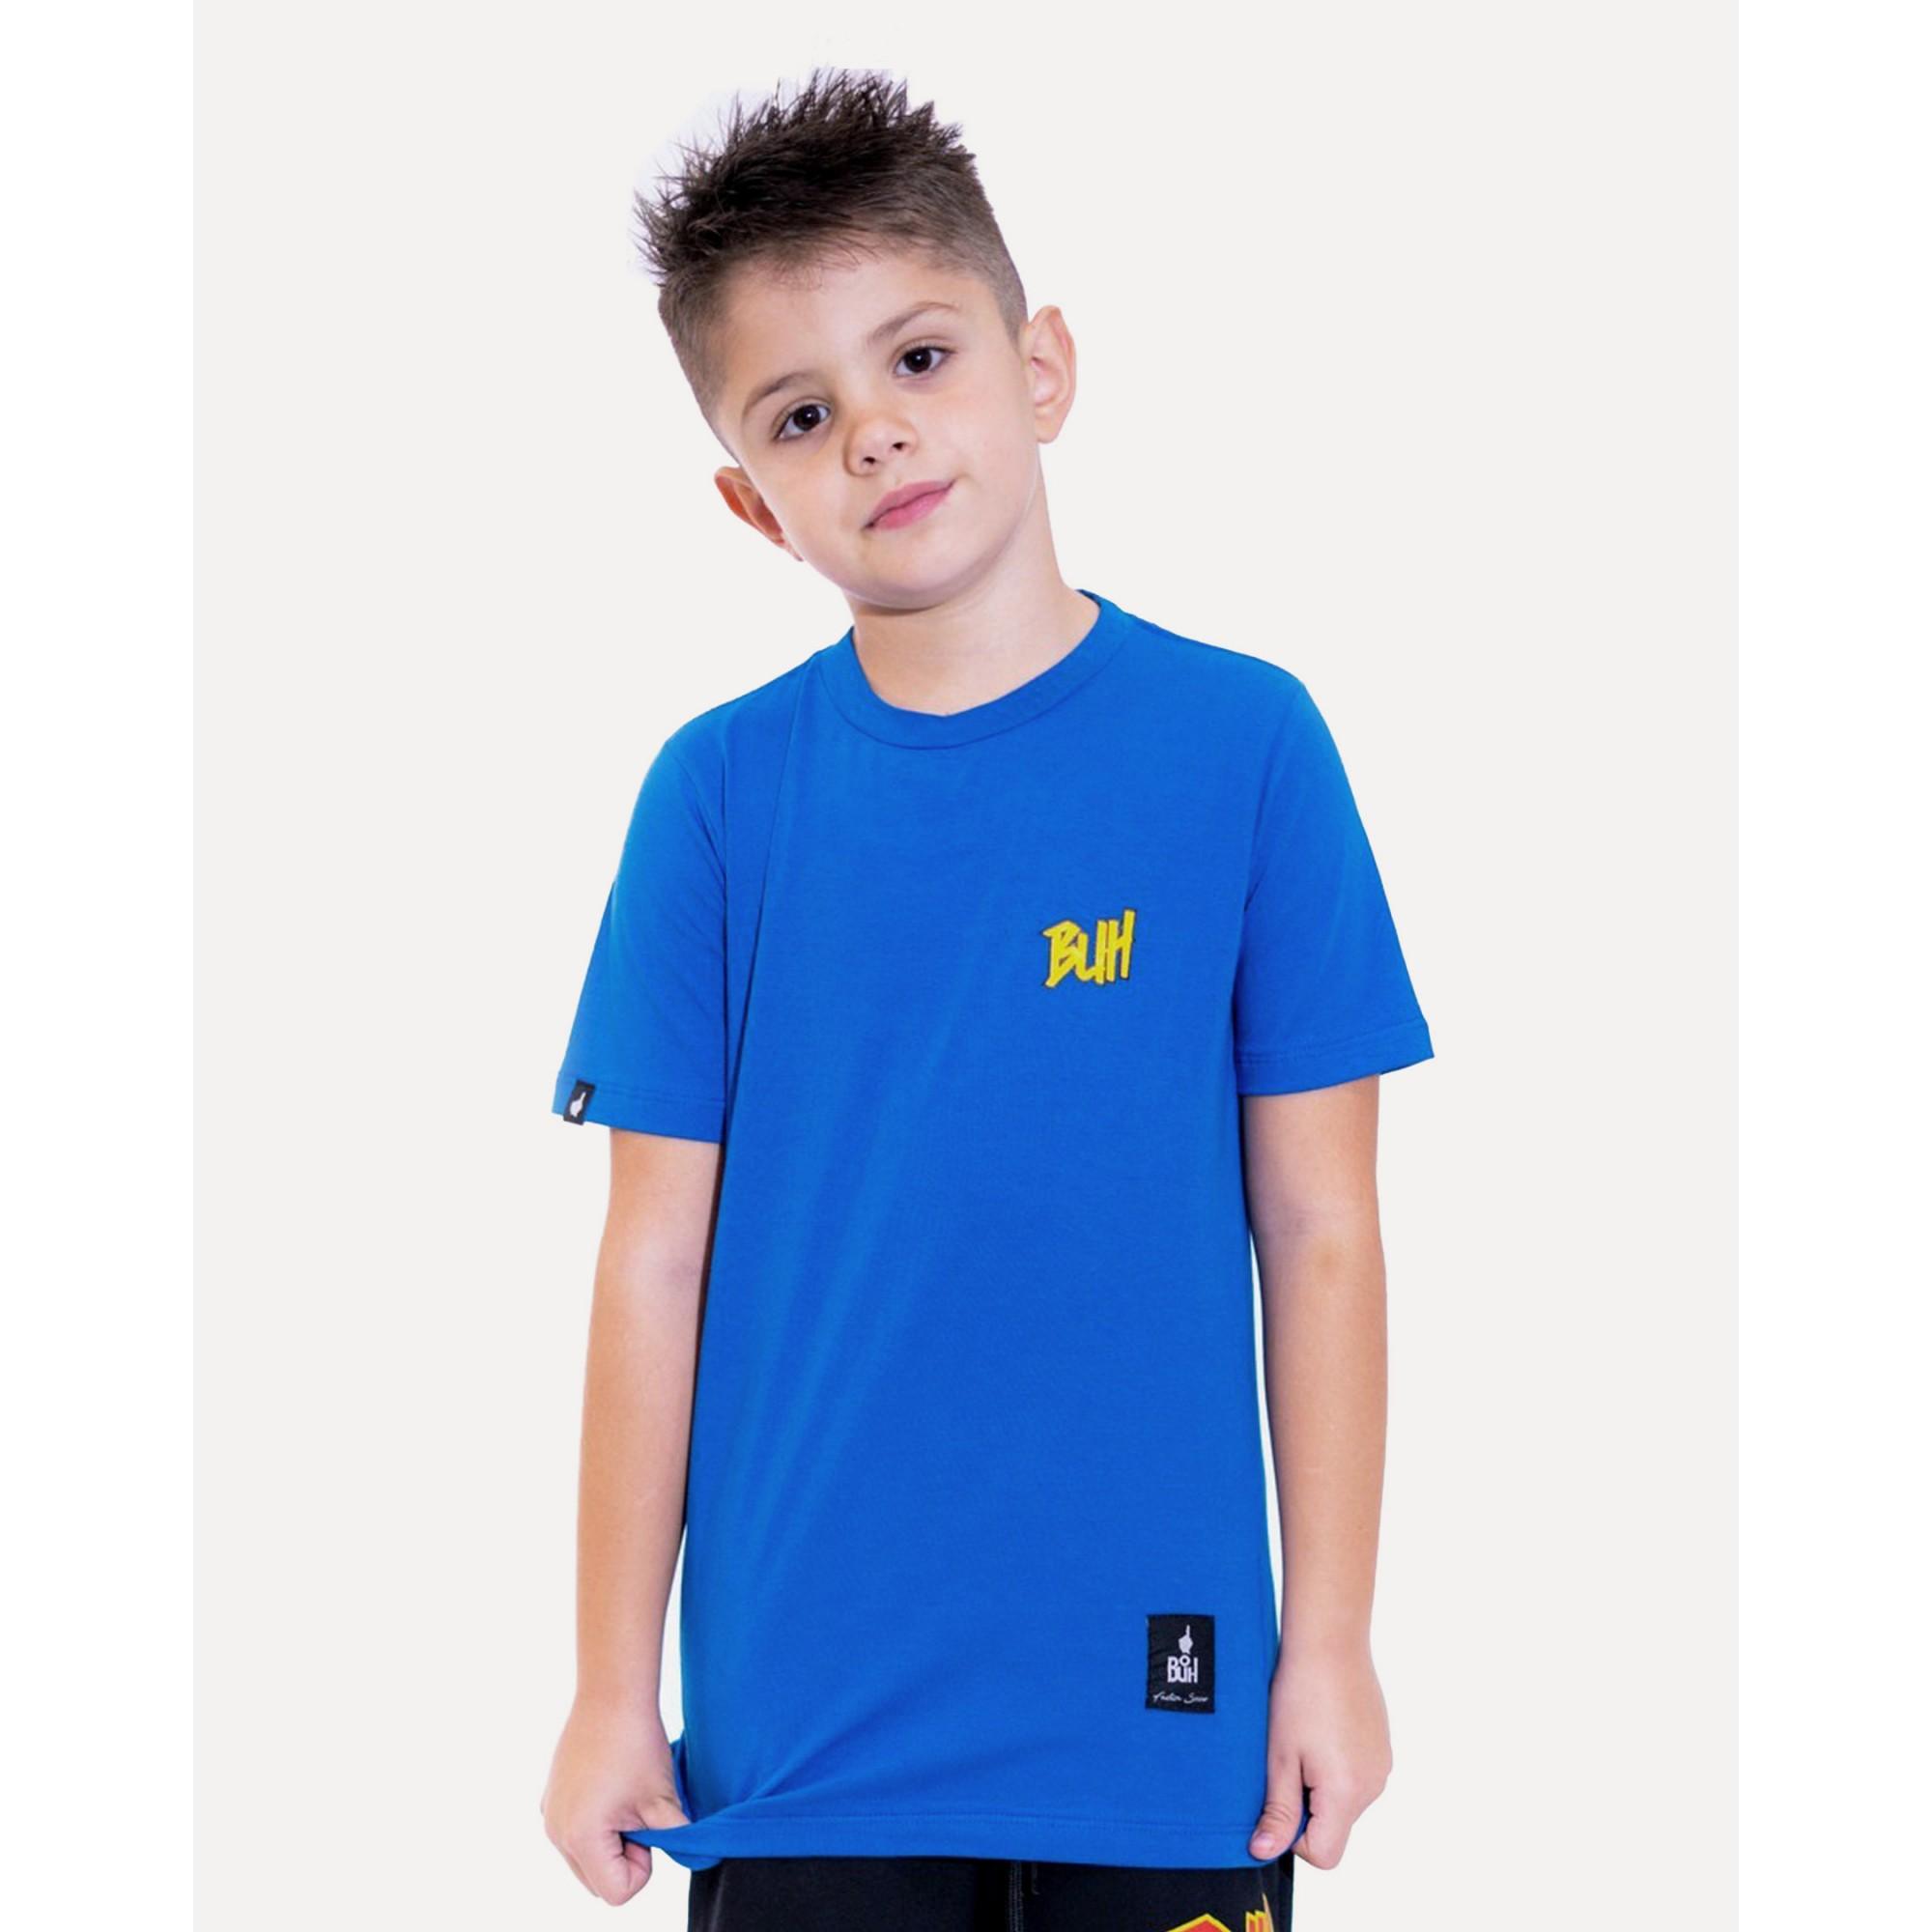 Camiseta Buh Kids Basic HQ Blue